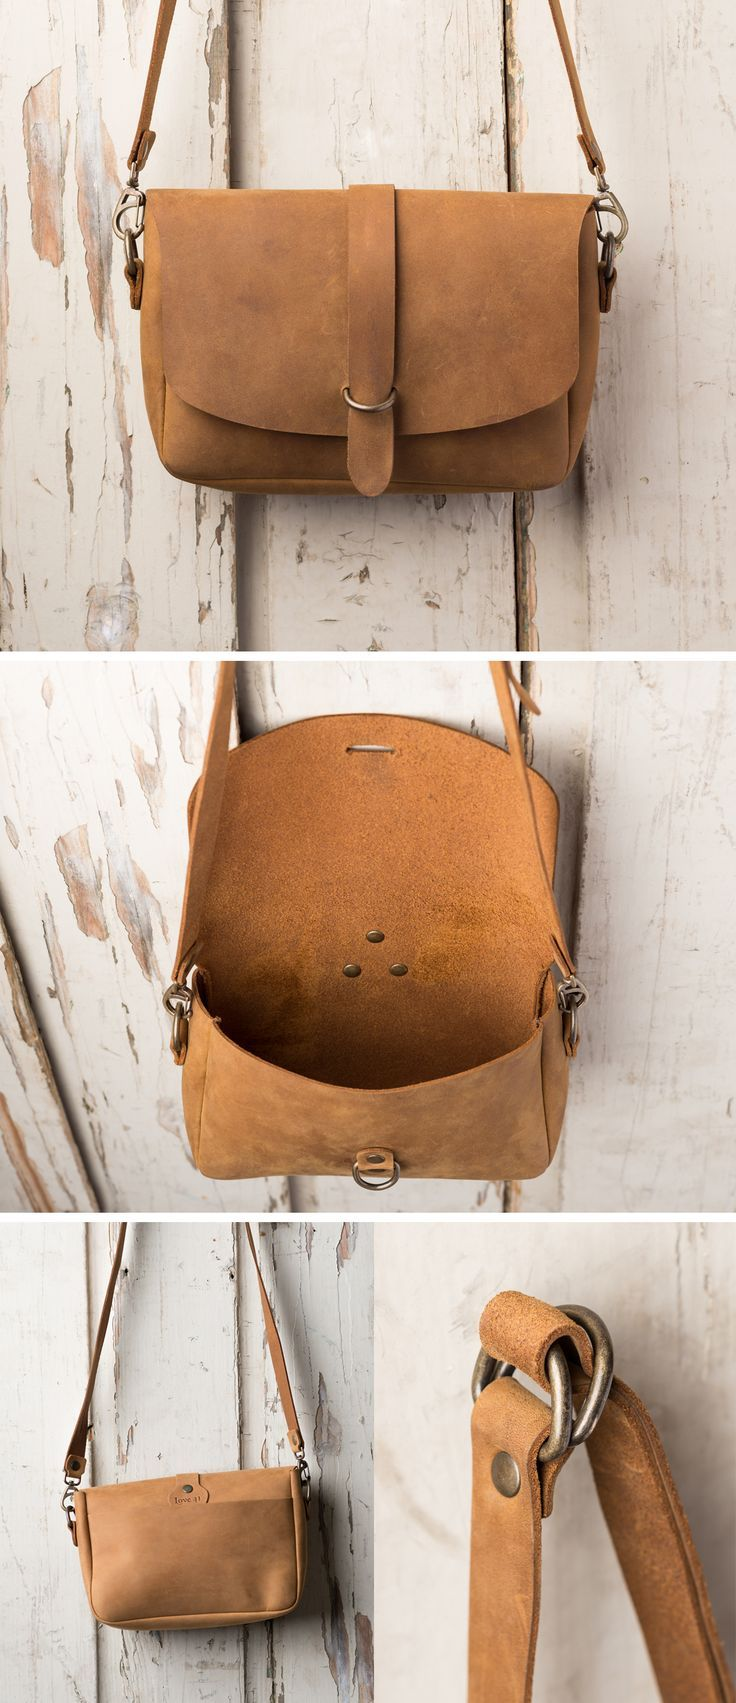 The Love 41 Crossbody Koroha in Tobacco | Full Grain Leather | 41 Year Warranty |  $86.00